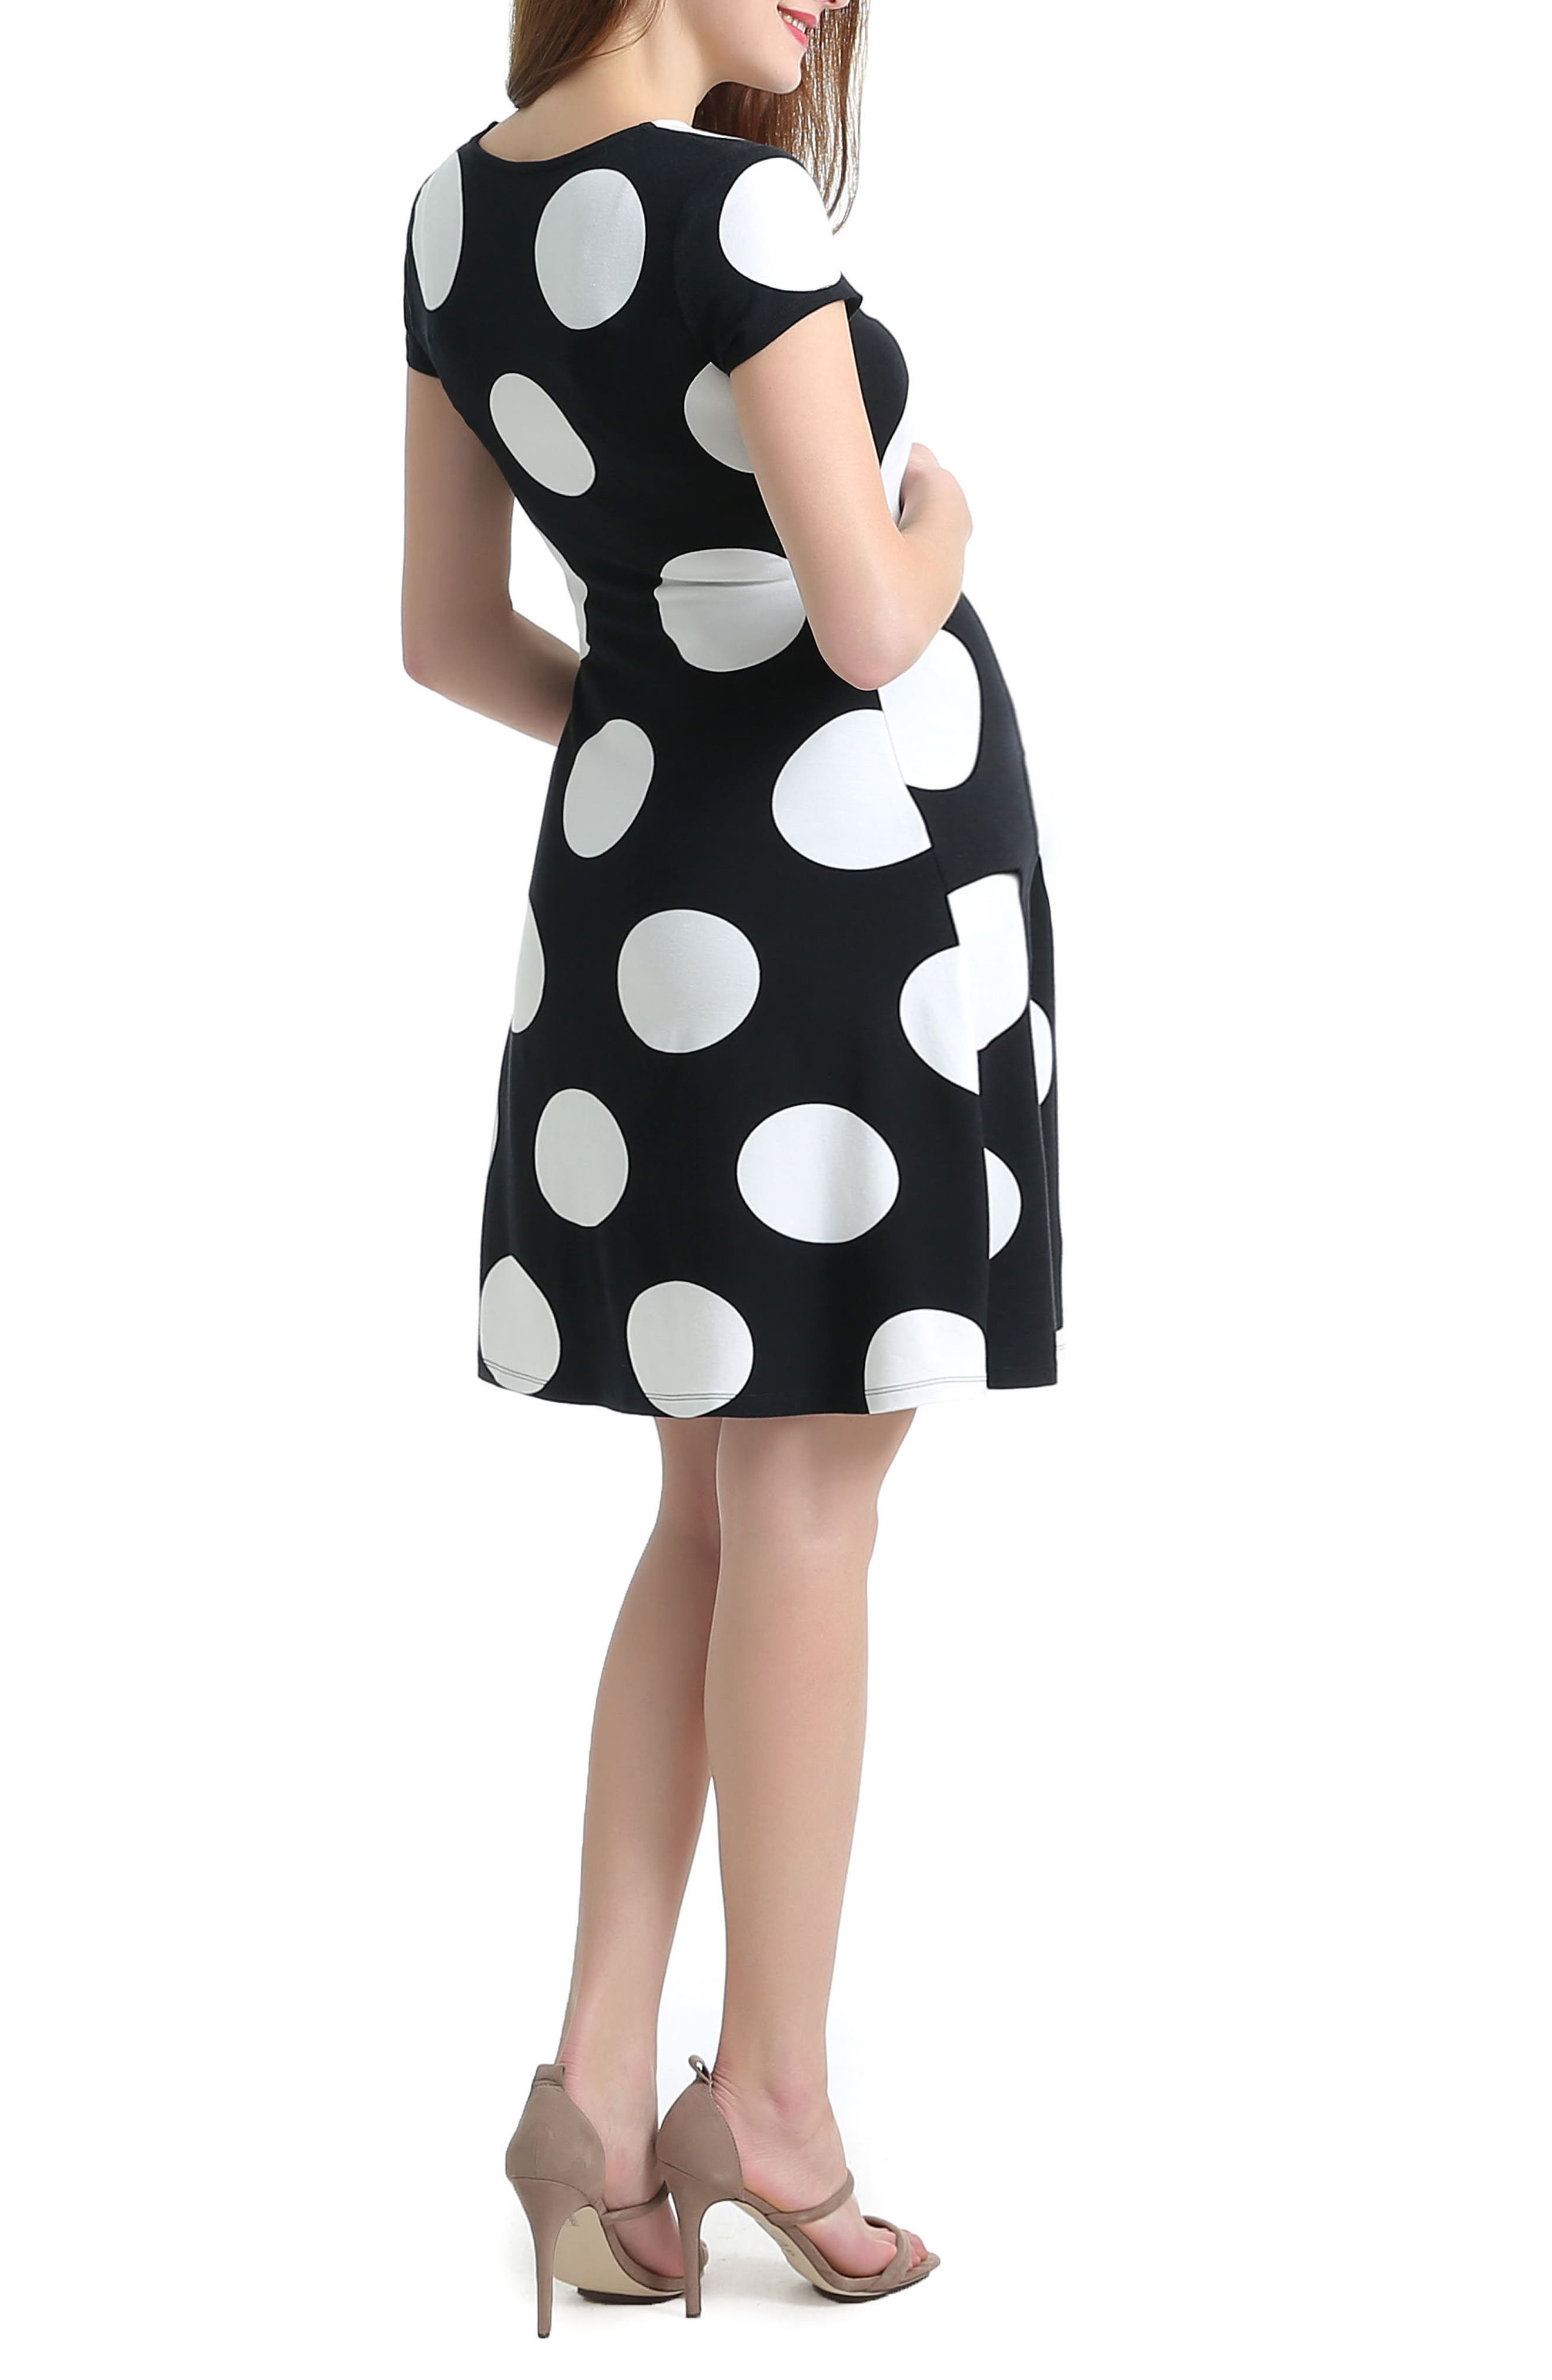 Joslyn Polka Dot A-Line Maternity Dress,                             Alternate thumbnail 2, color,                             Black/ White